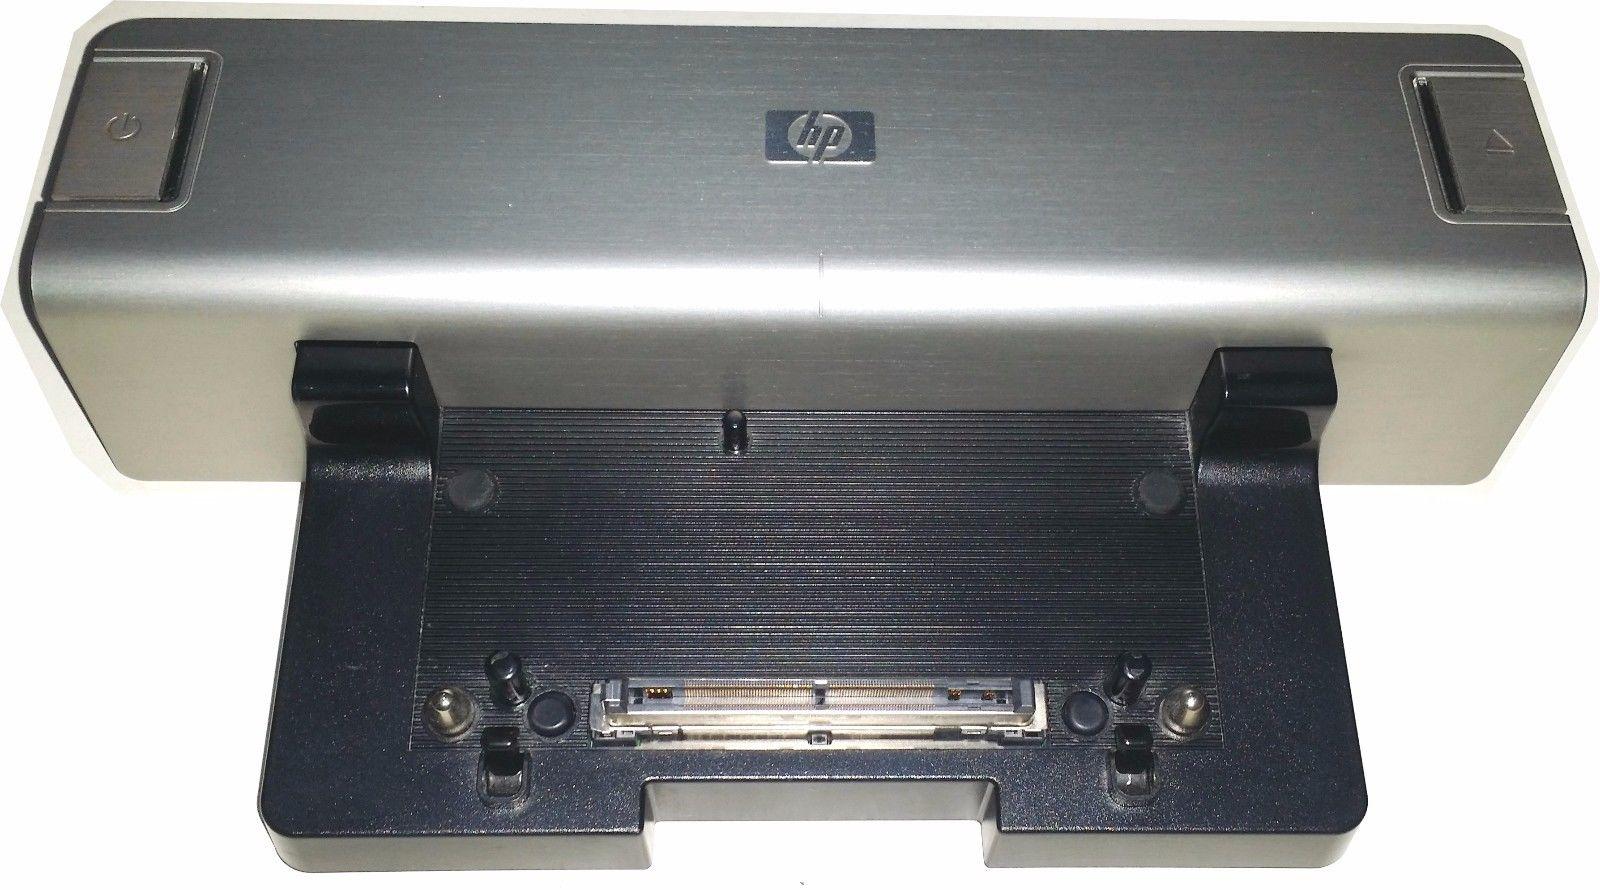 HP Compaq 8710p Notebook Universal PostScript Print Windows 8 X64